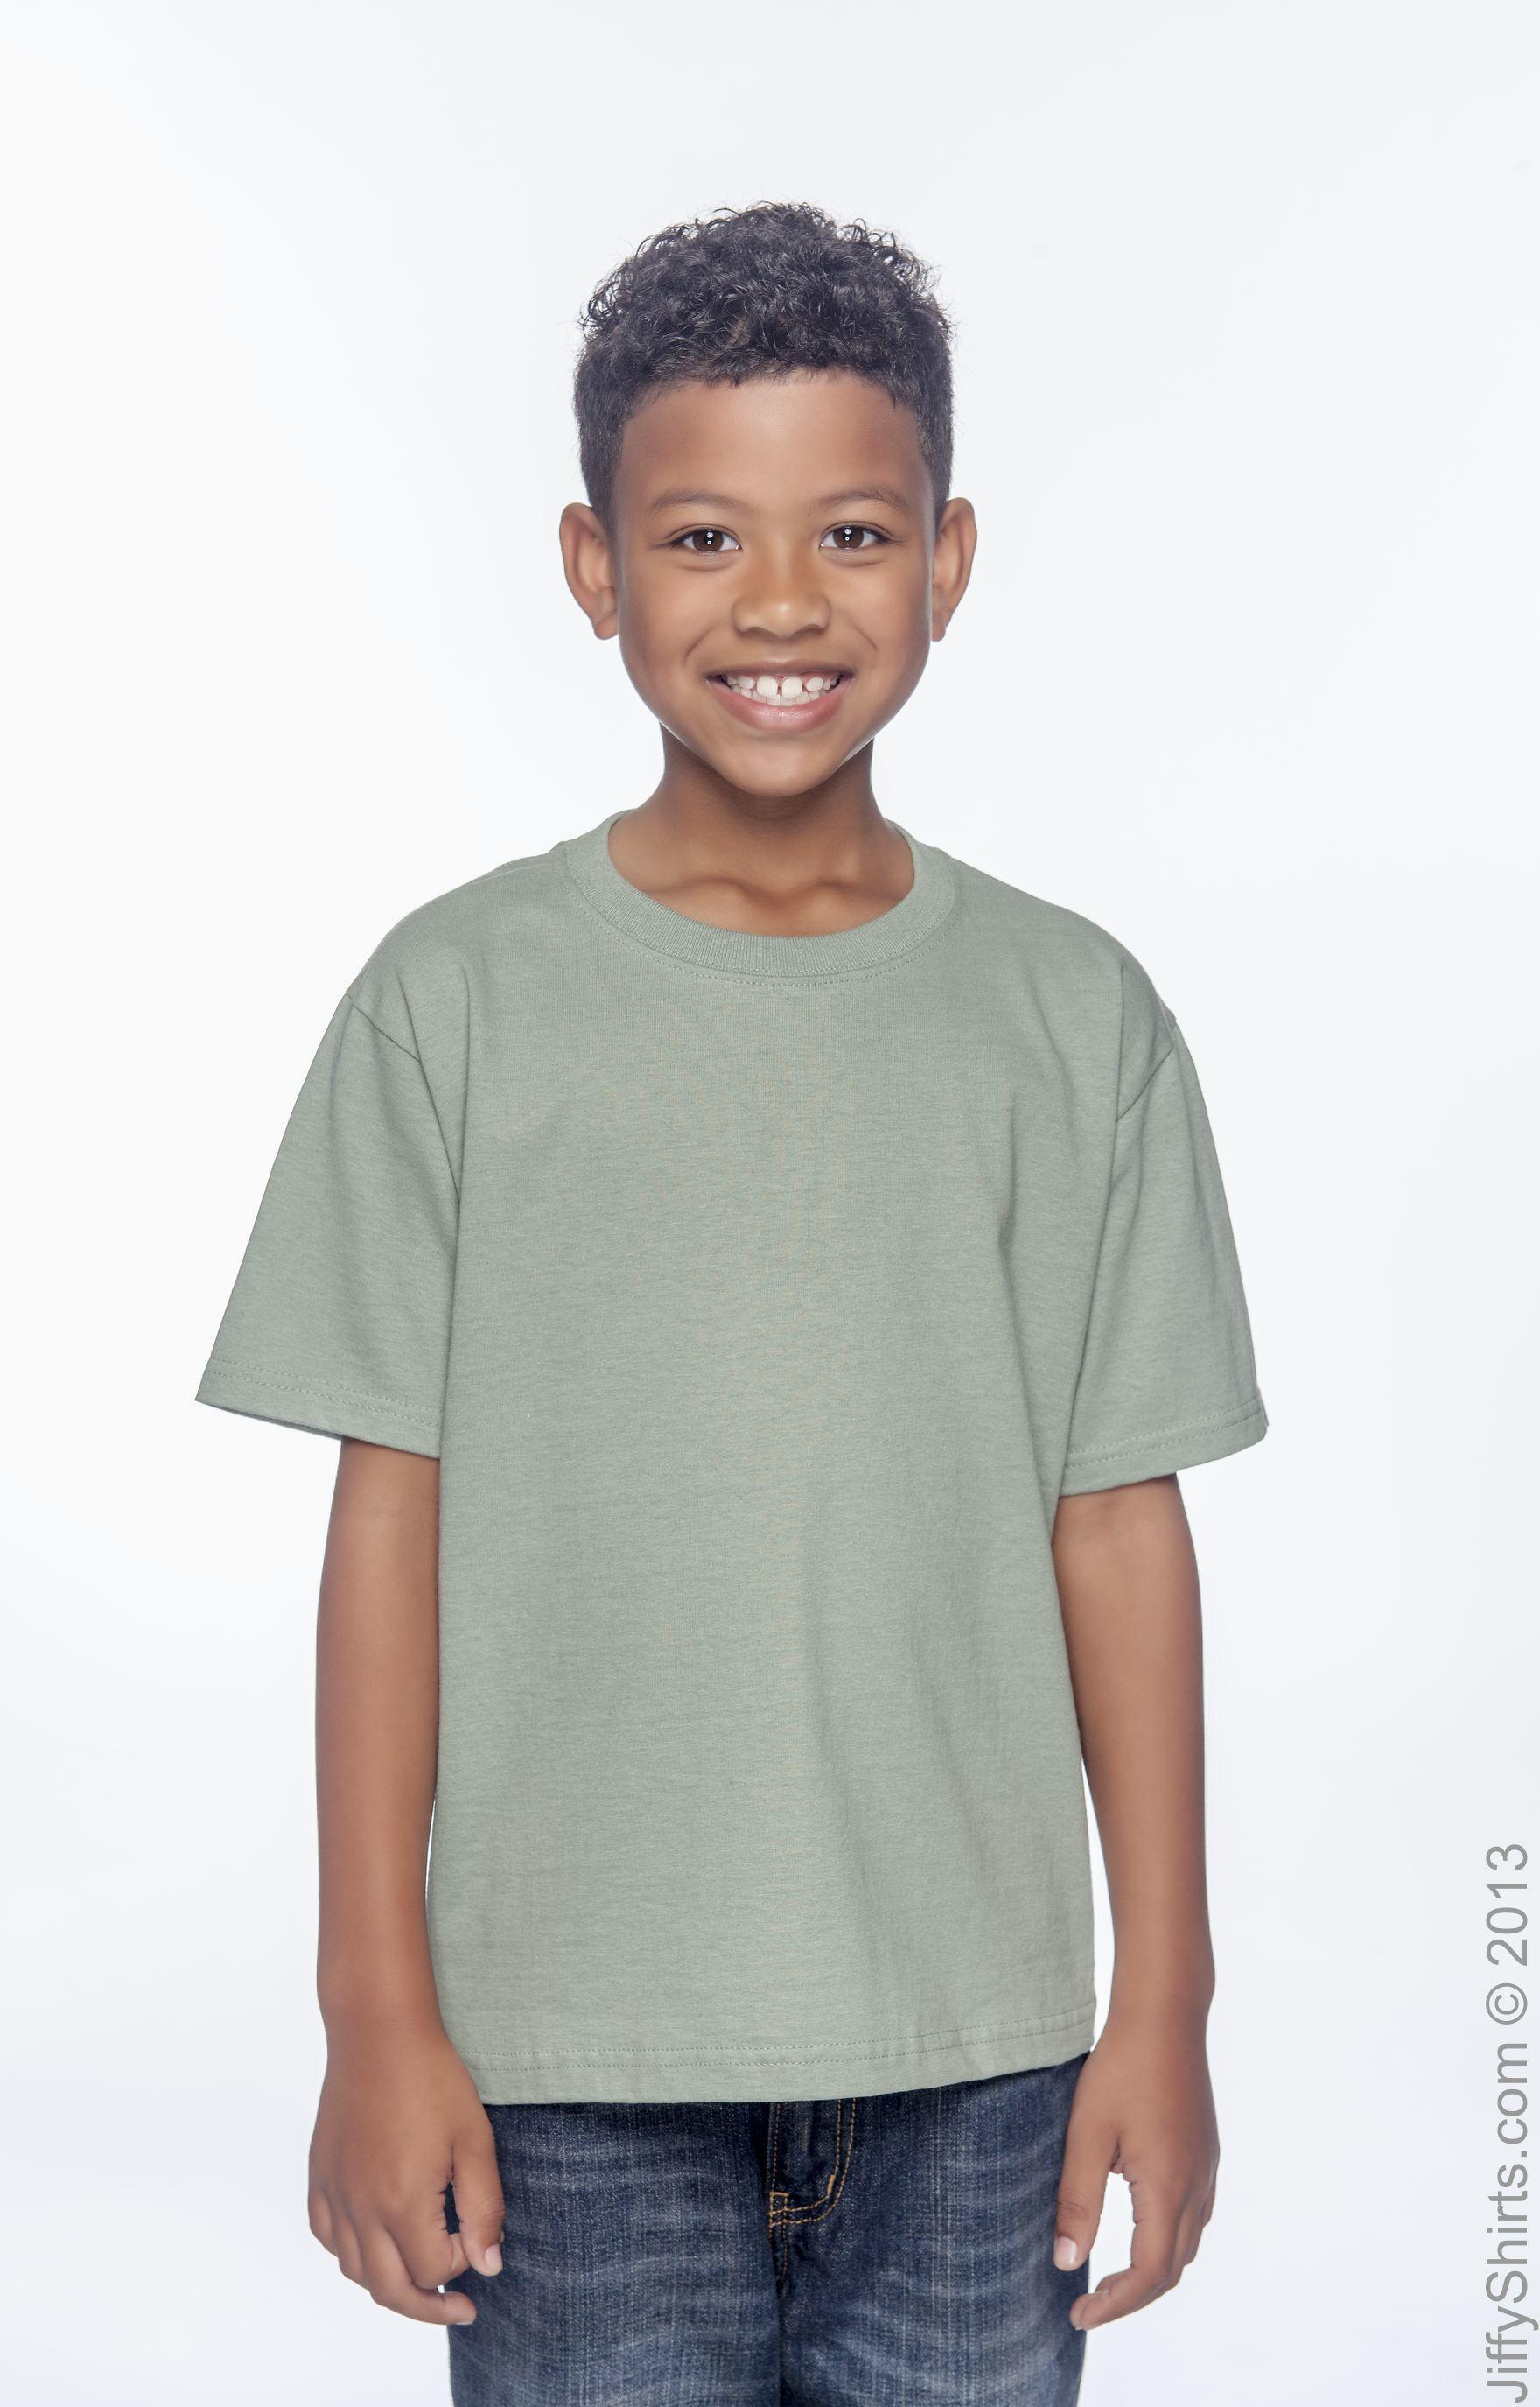 Buy childrens plain white t shirts bulk 64 off for White t shirts in bulk